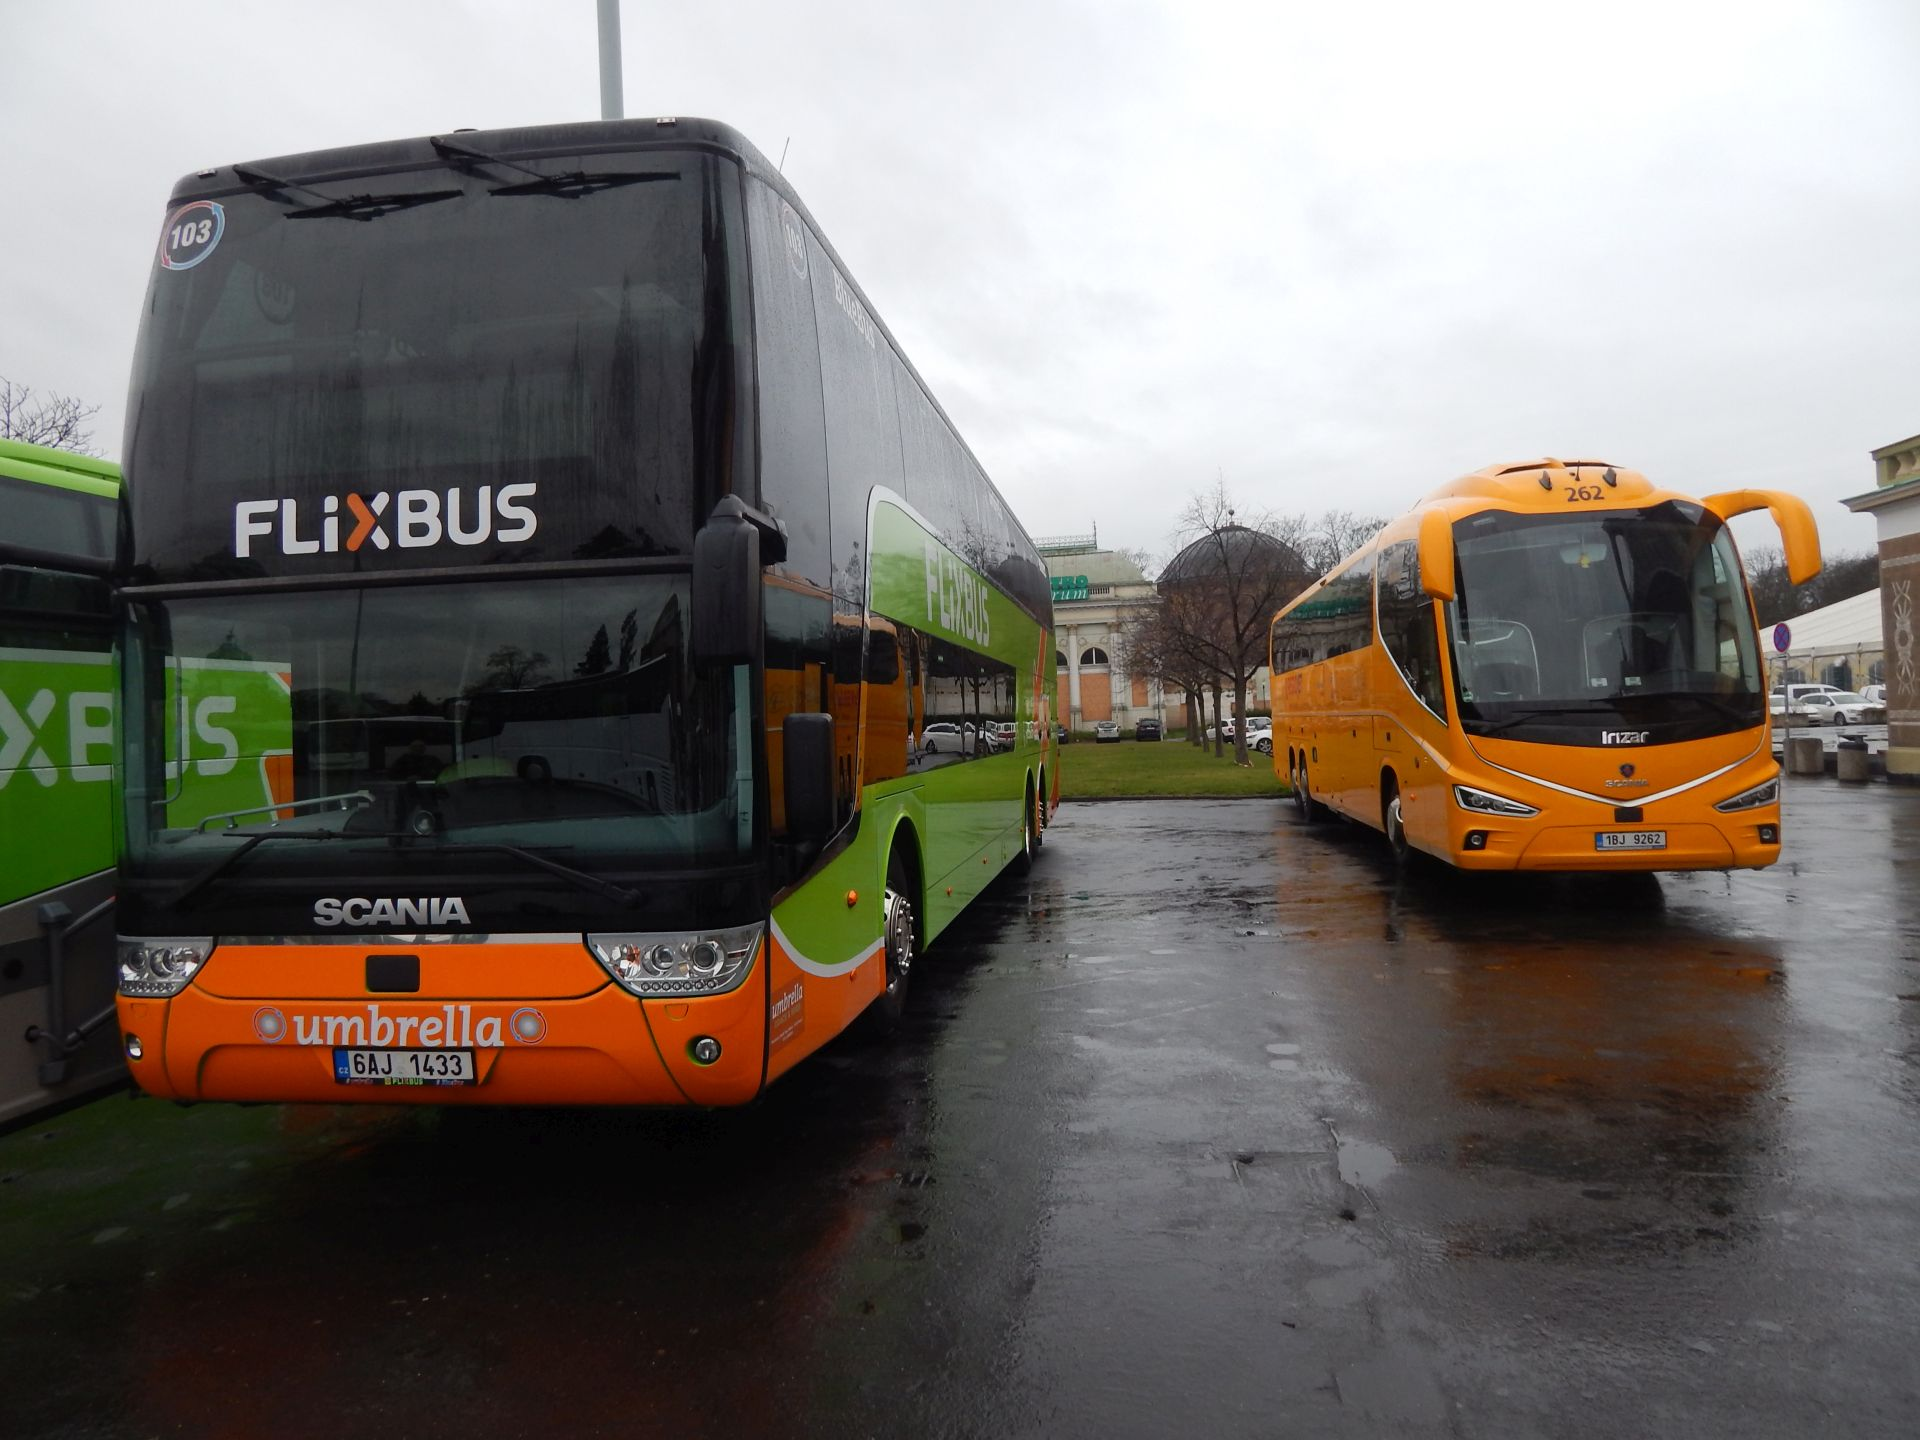 Flixbus versus Regiojet. Kdo nakonec bude ten vzadu? Autor: Zdopravy.cz/Jan Šindelář